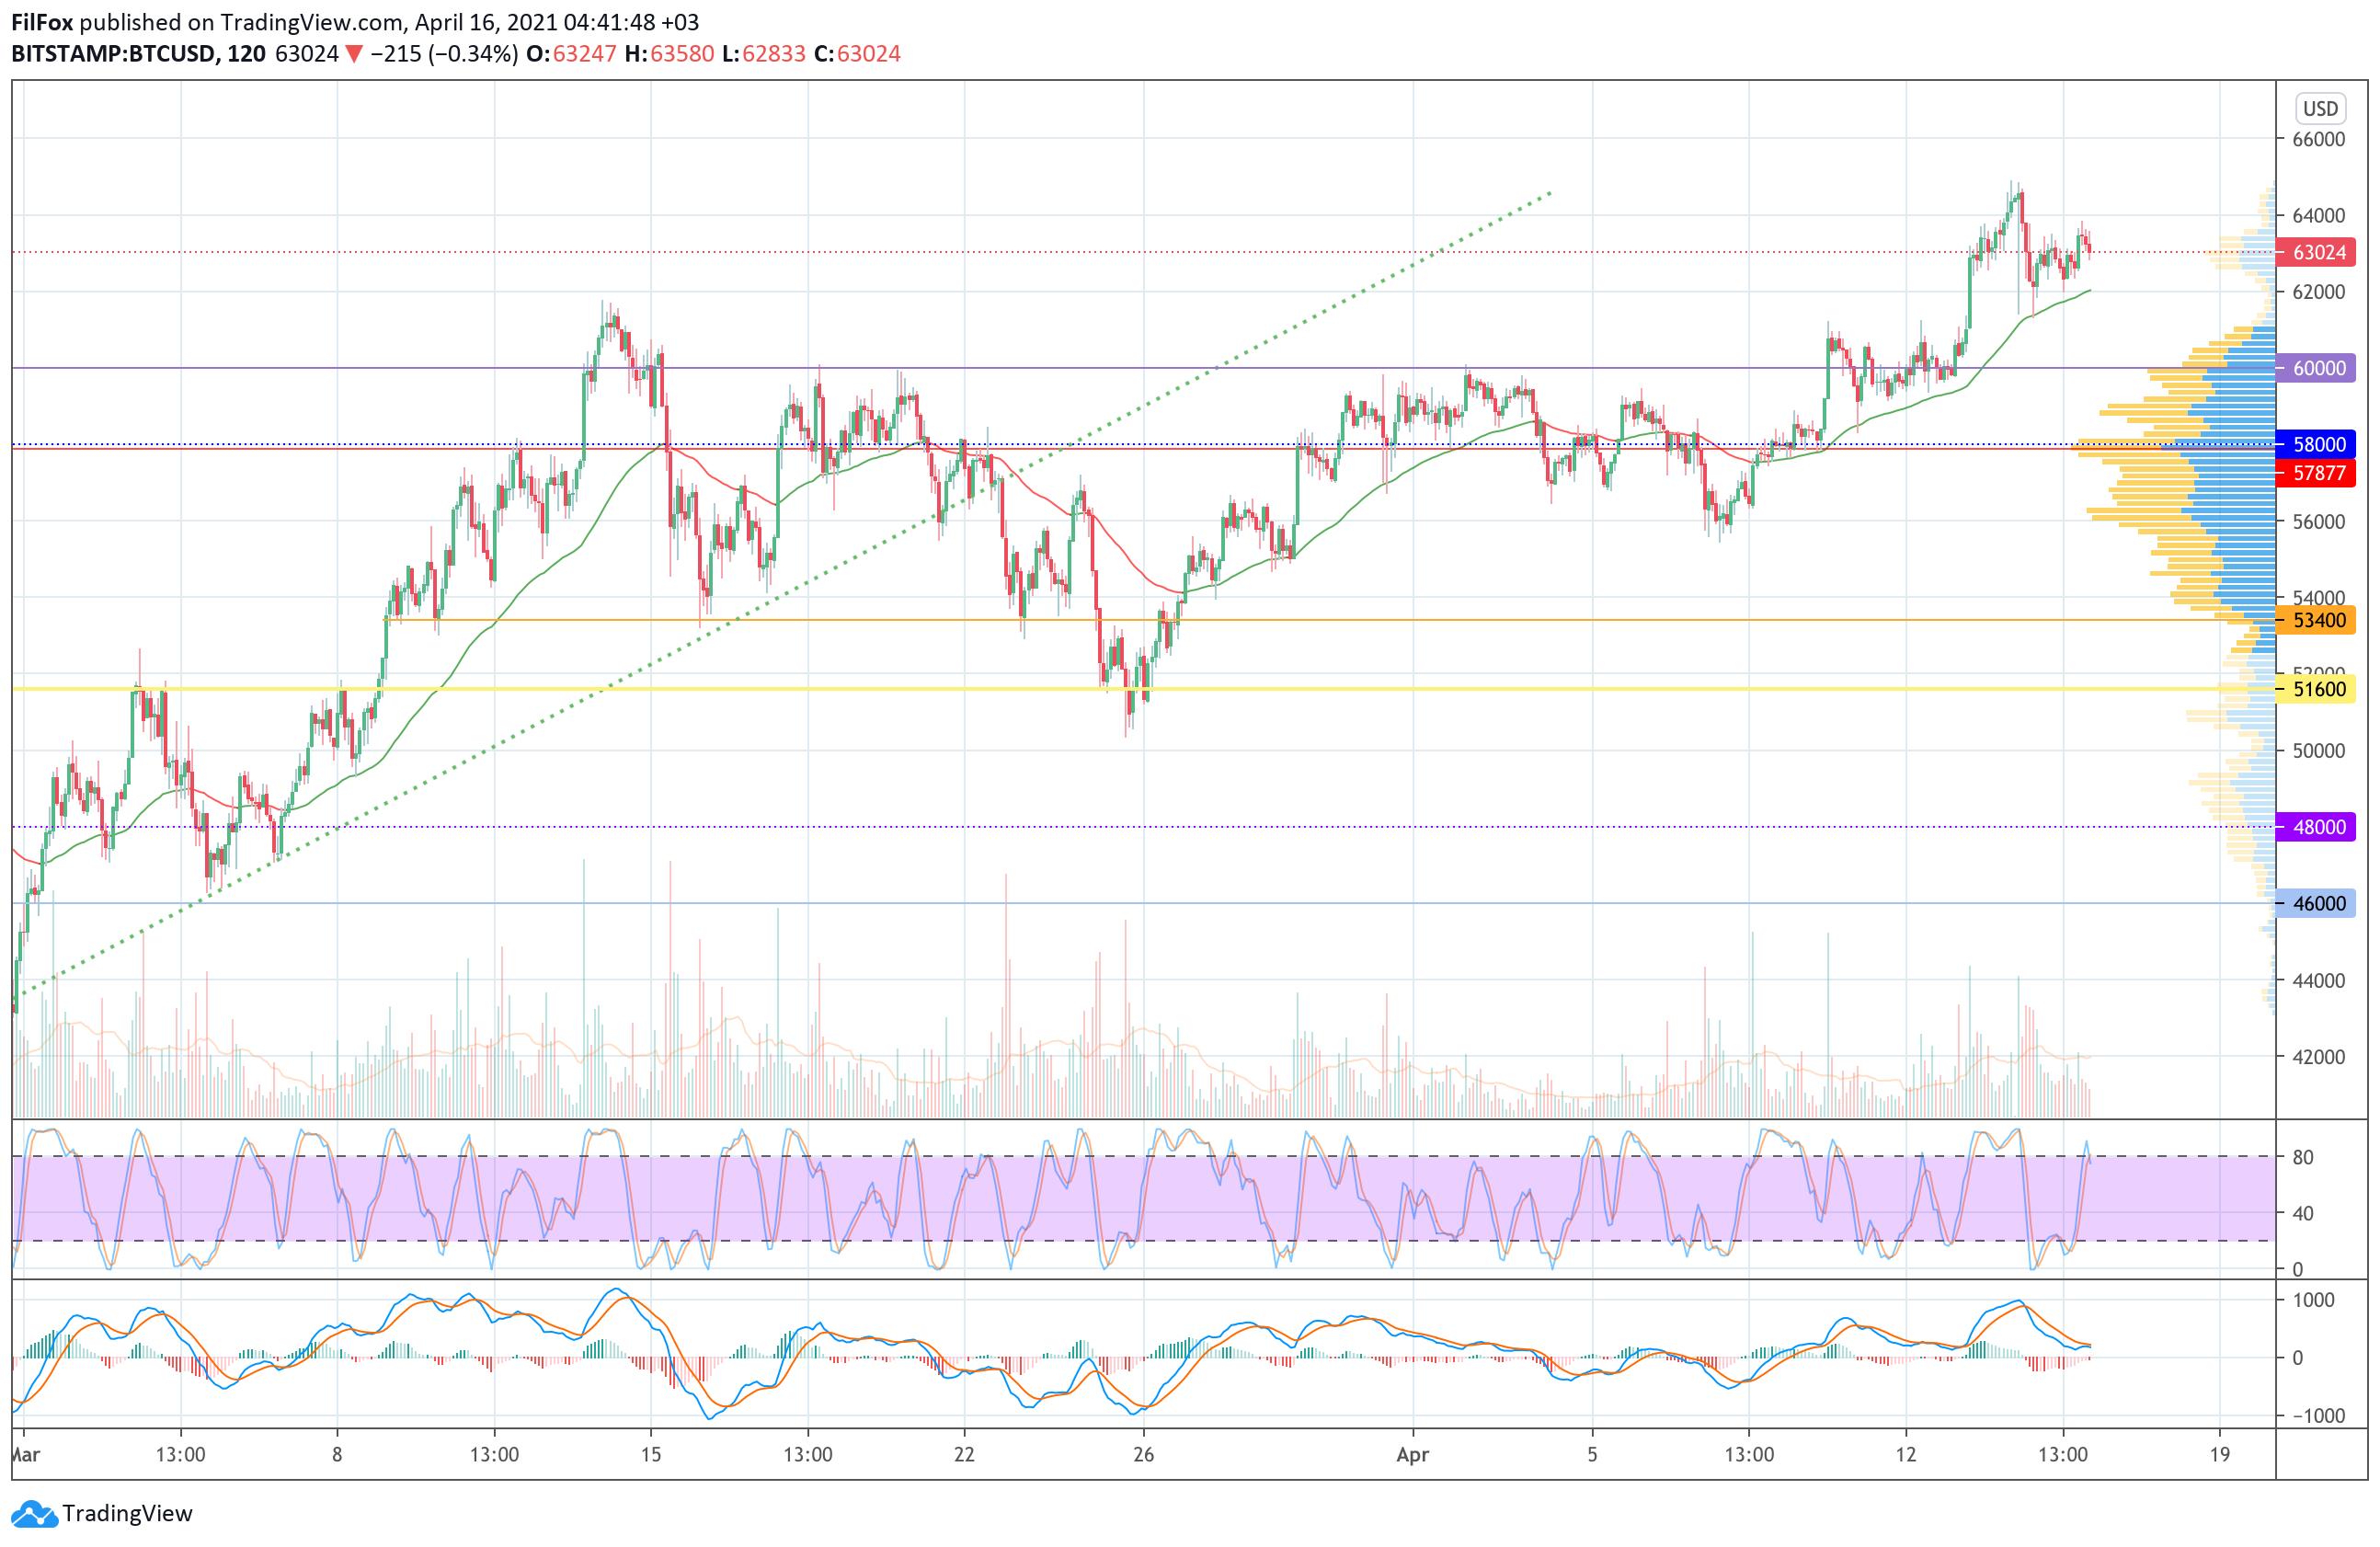 006703 - Анализ цен Bitcoin, Ethereum, XRP на 16.04.2021